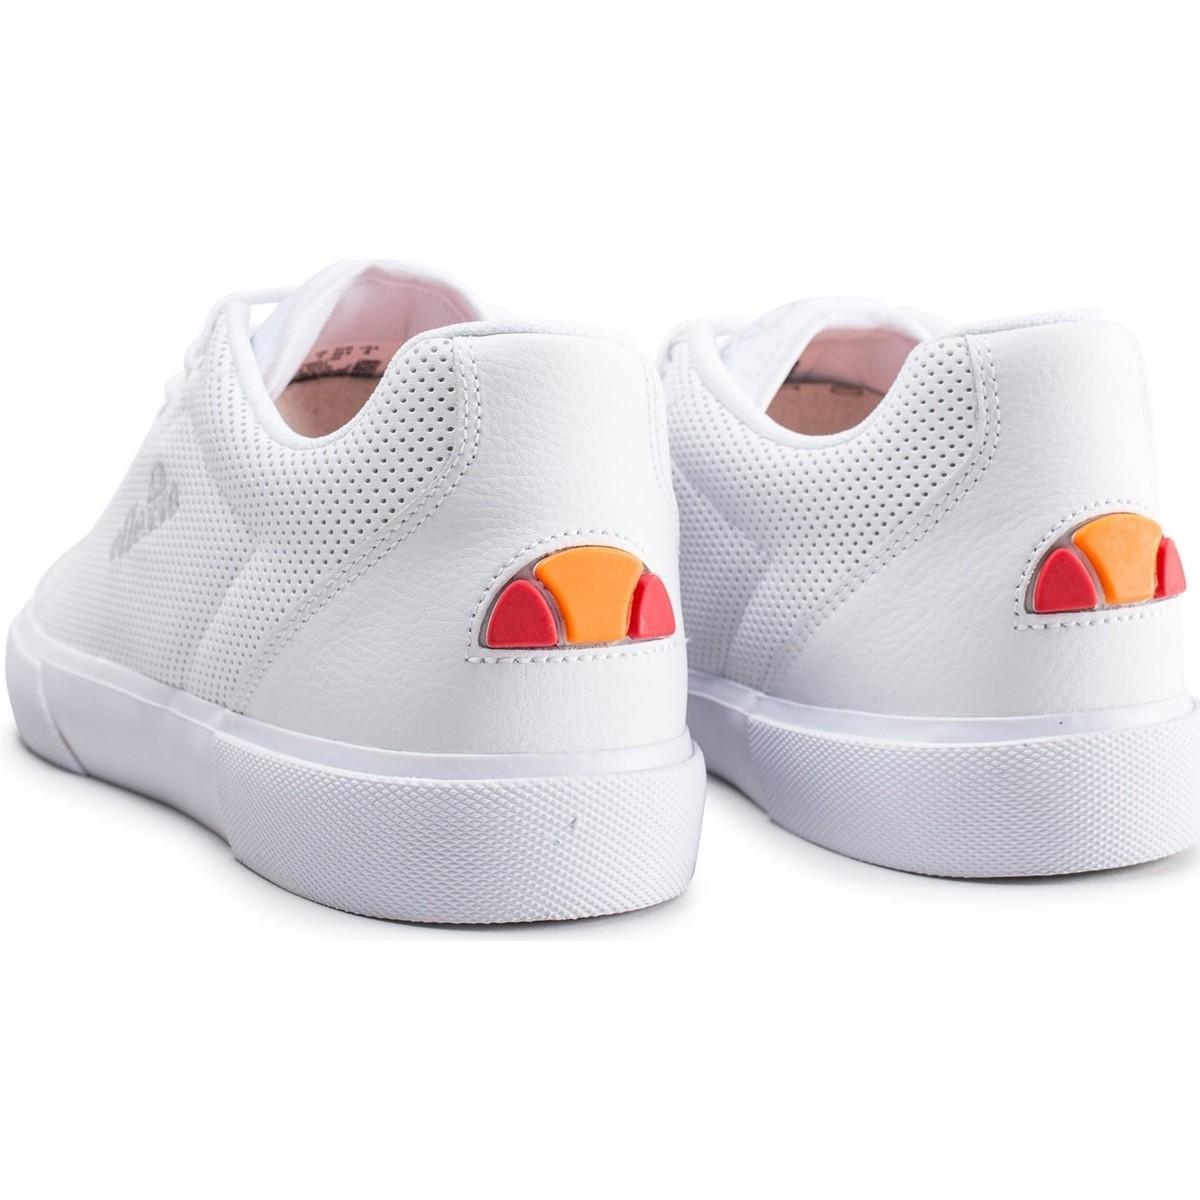 Ellesse Taggia he Femme Autres Chaussures Baskets basses